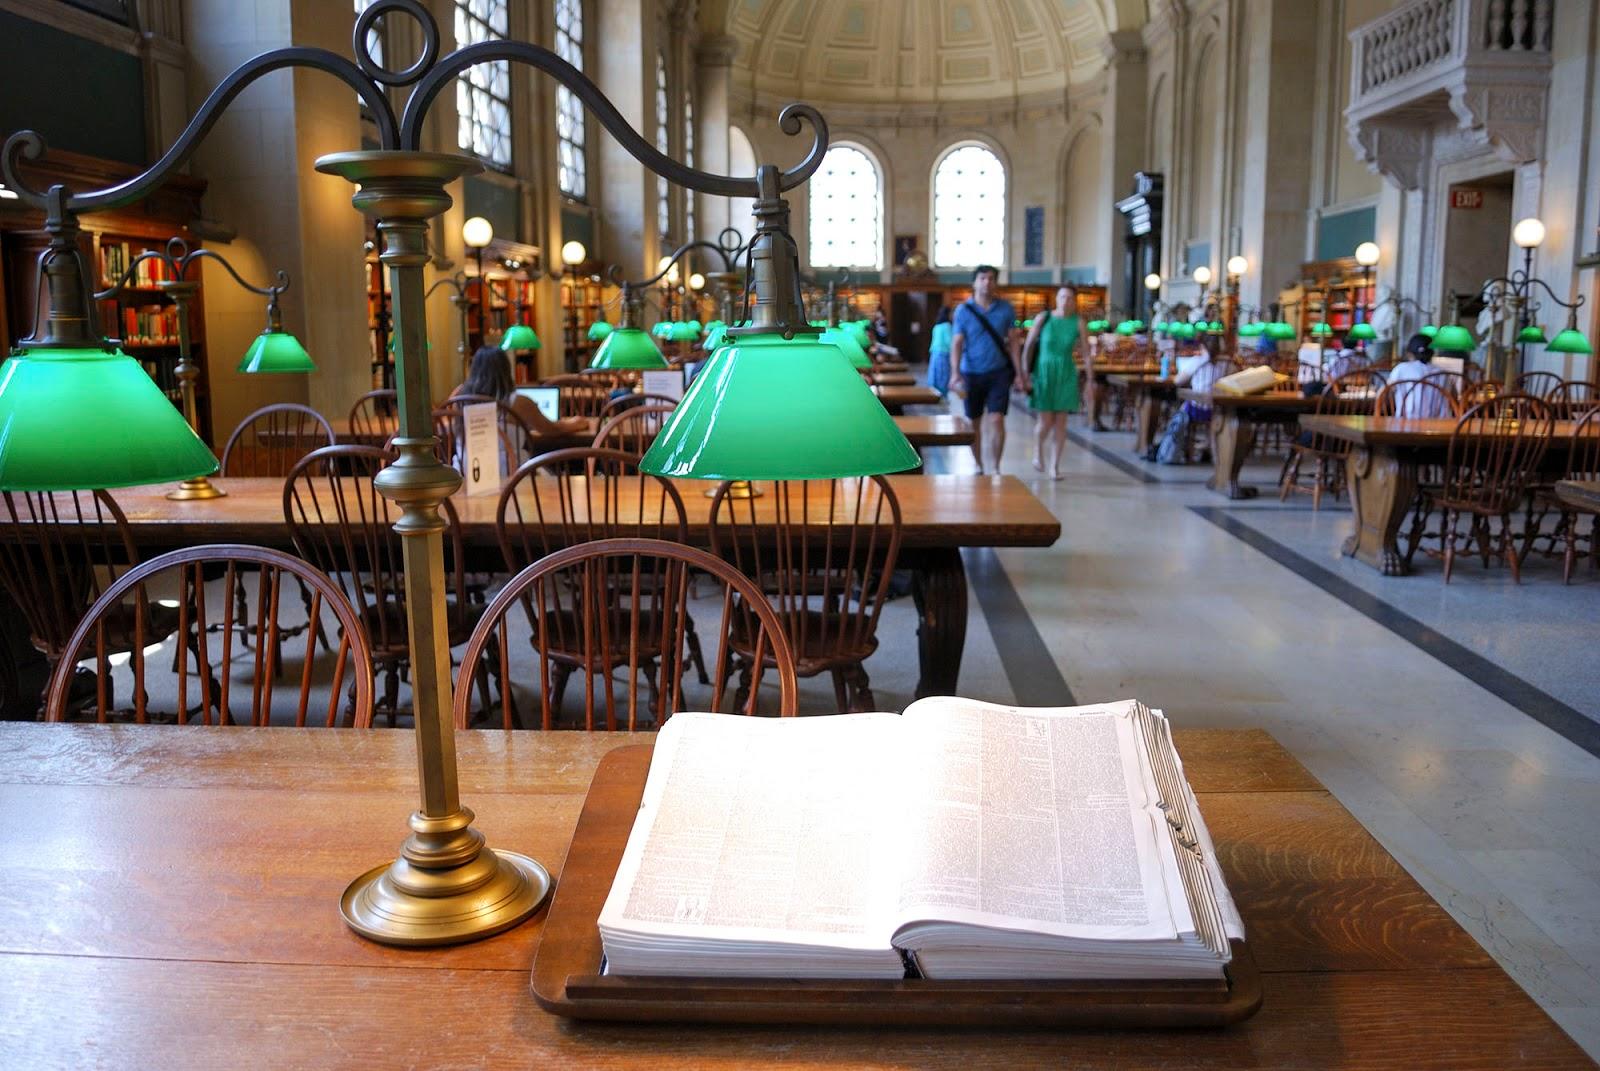 public library copley square boston itinerary plan guide tourism usa america park east coast